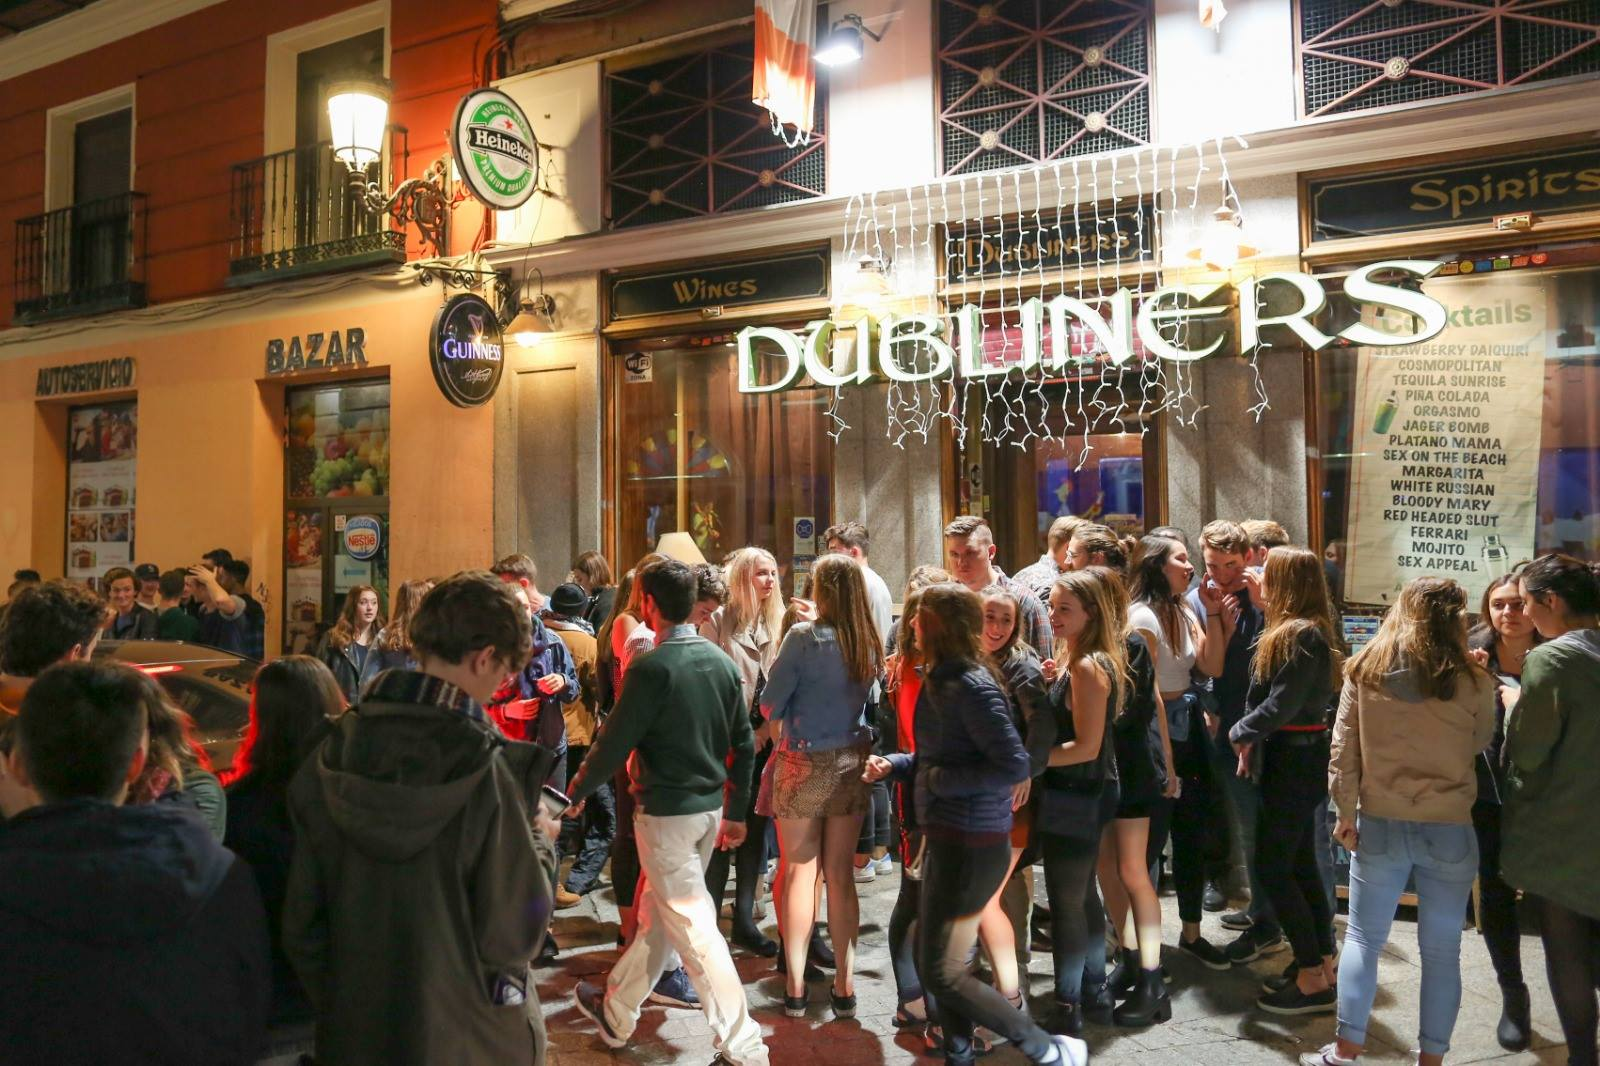 Dubliners Madrid